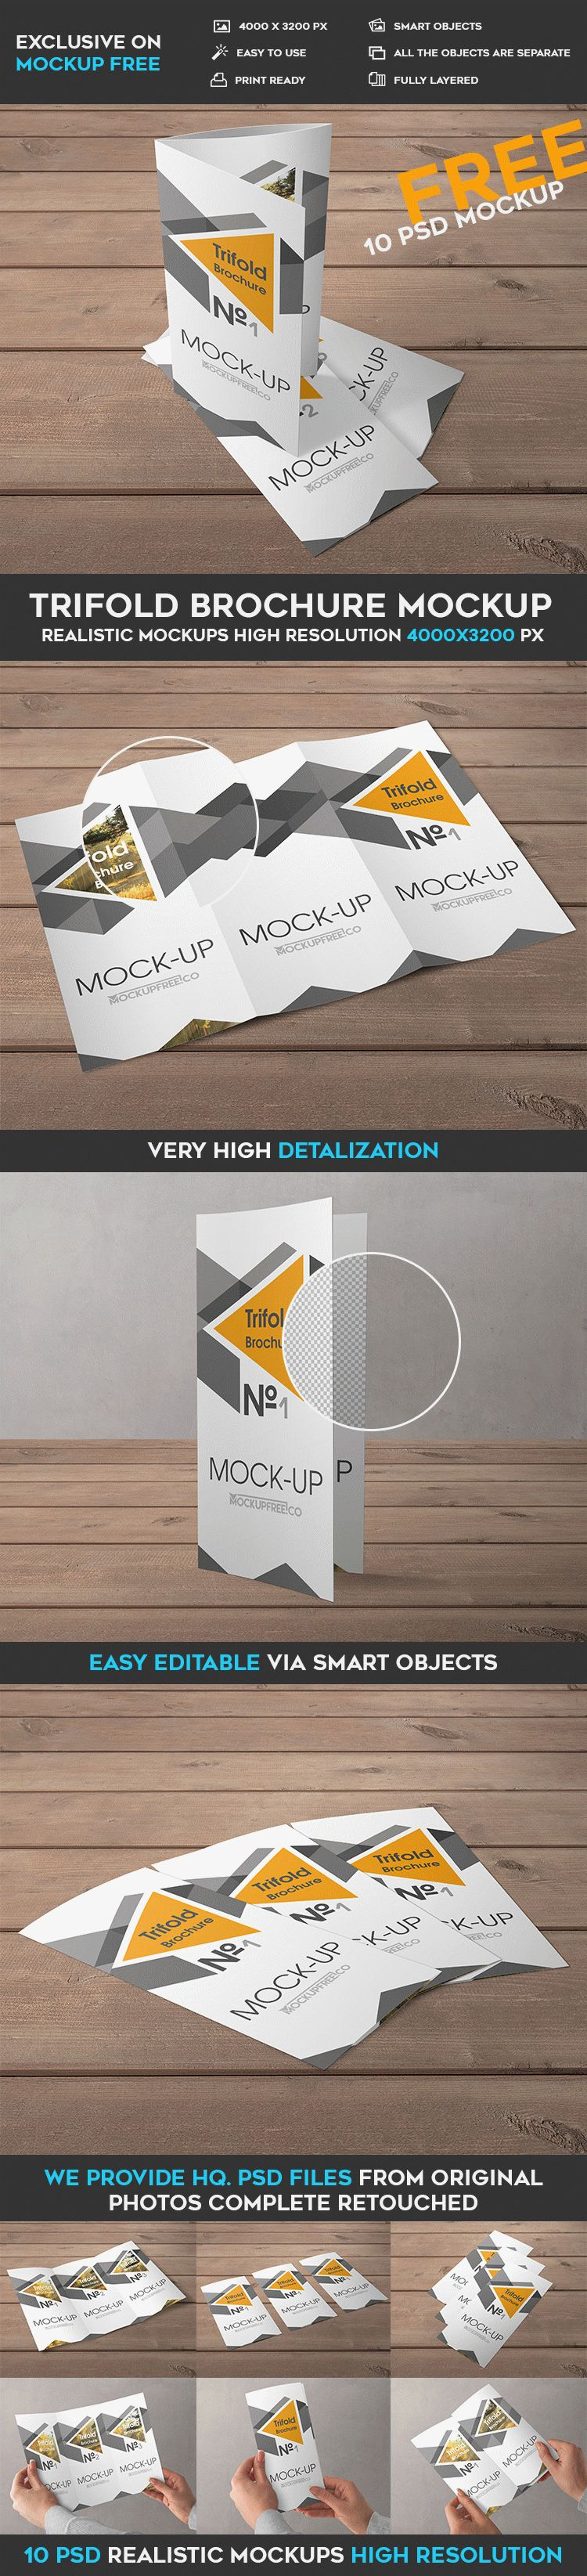 Trifold Brochure - 10 Free PSD Mockups